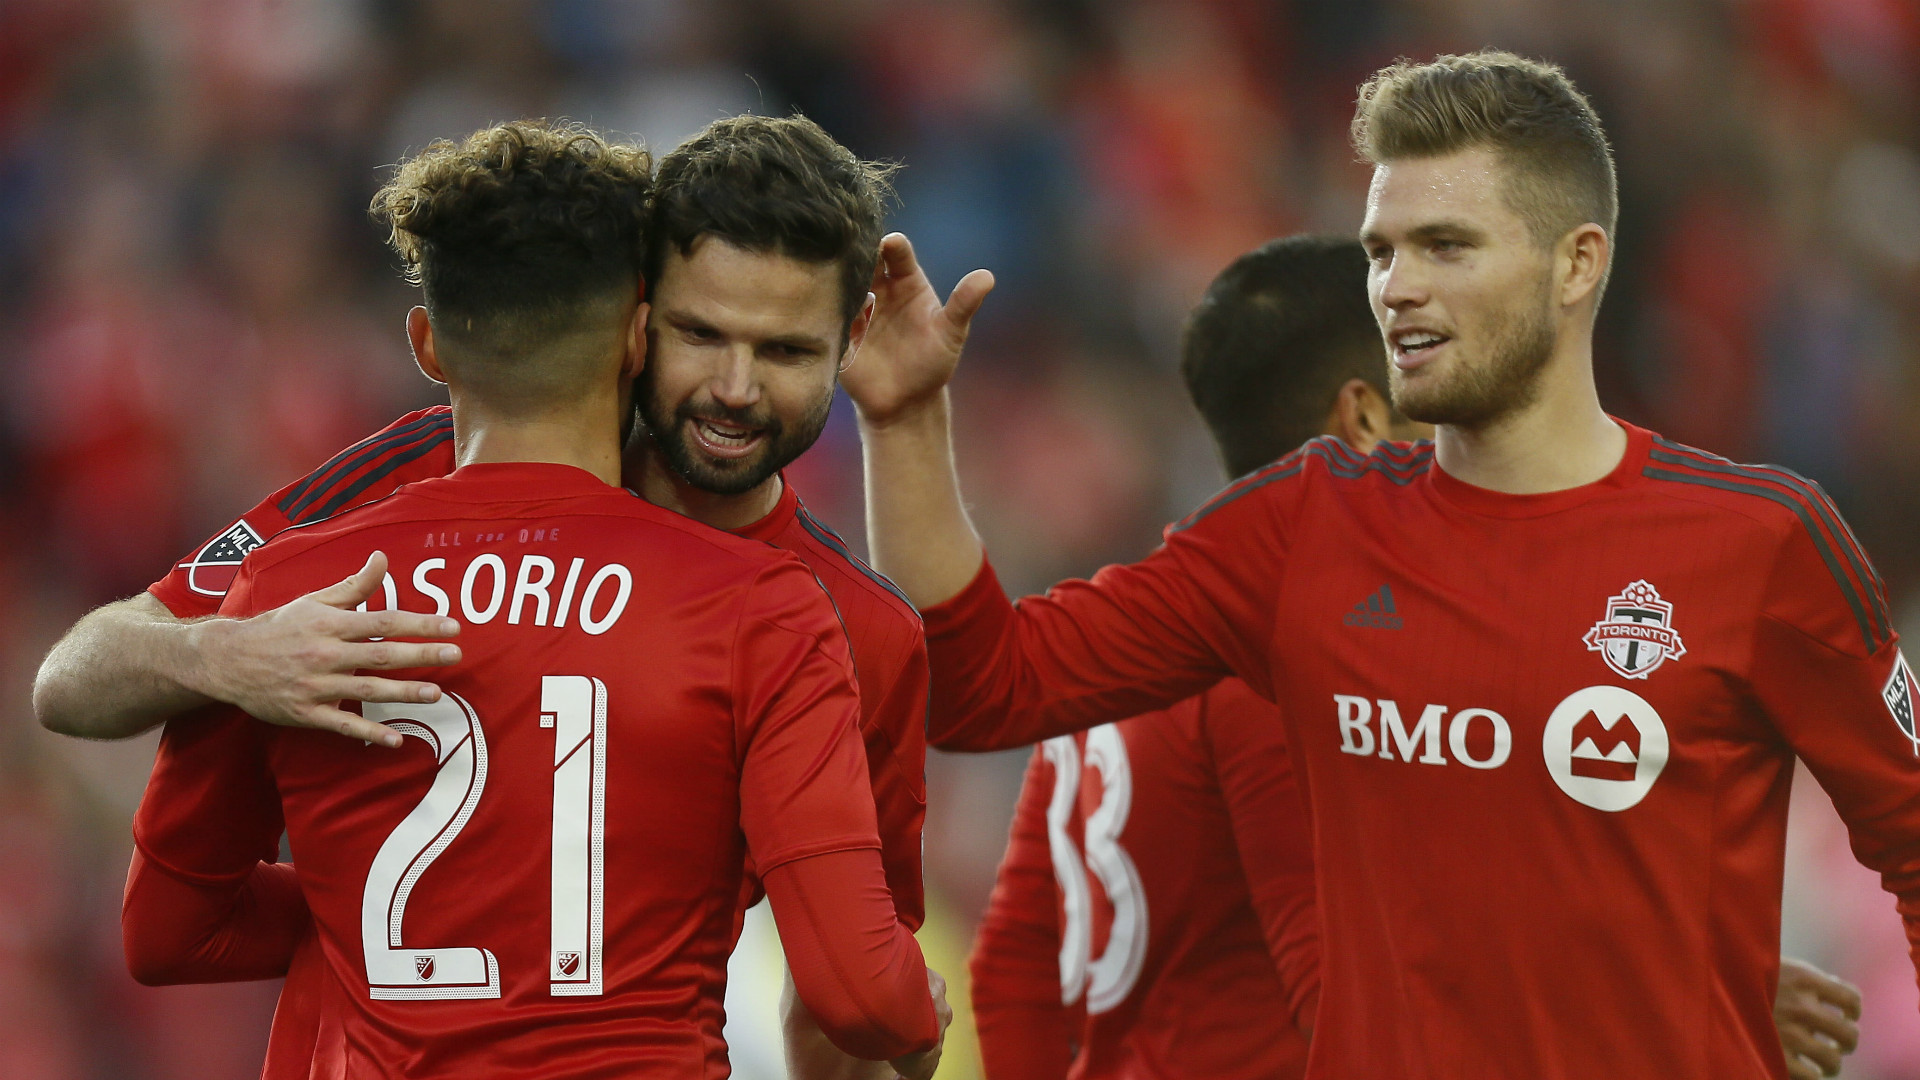 Drew-moor-and-eriq-zavaleta-congratulate-midfielder-jonathan-osorio-toronto-fc-mls-20161023_1uew7g9ggvgjg1mvnk7d2rm7to